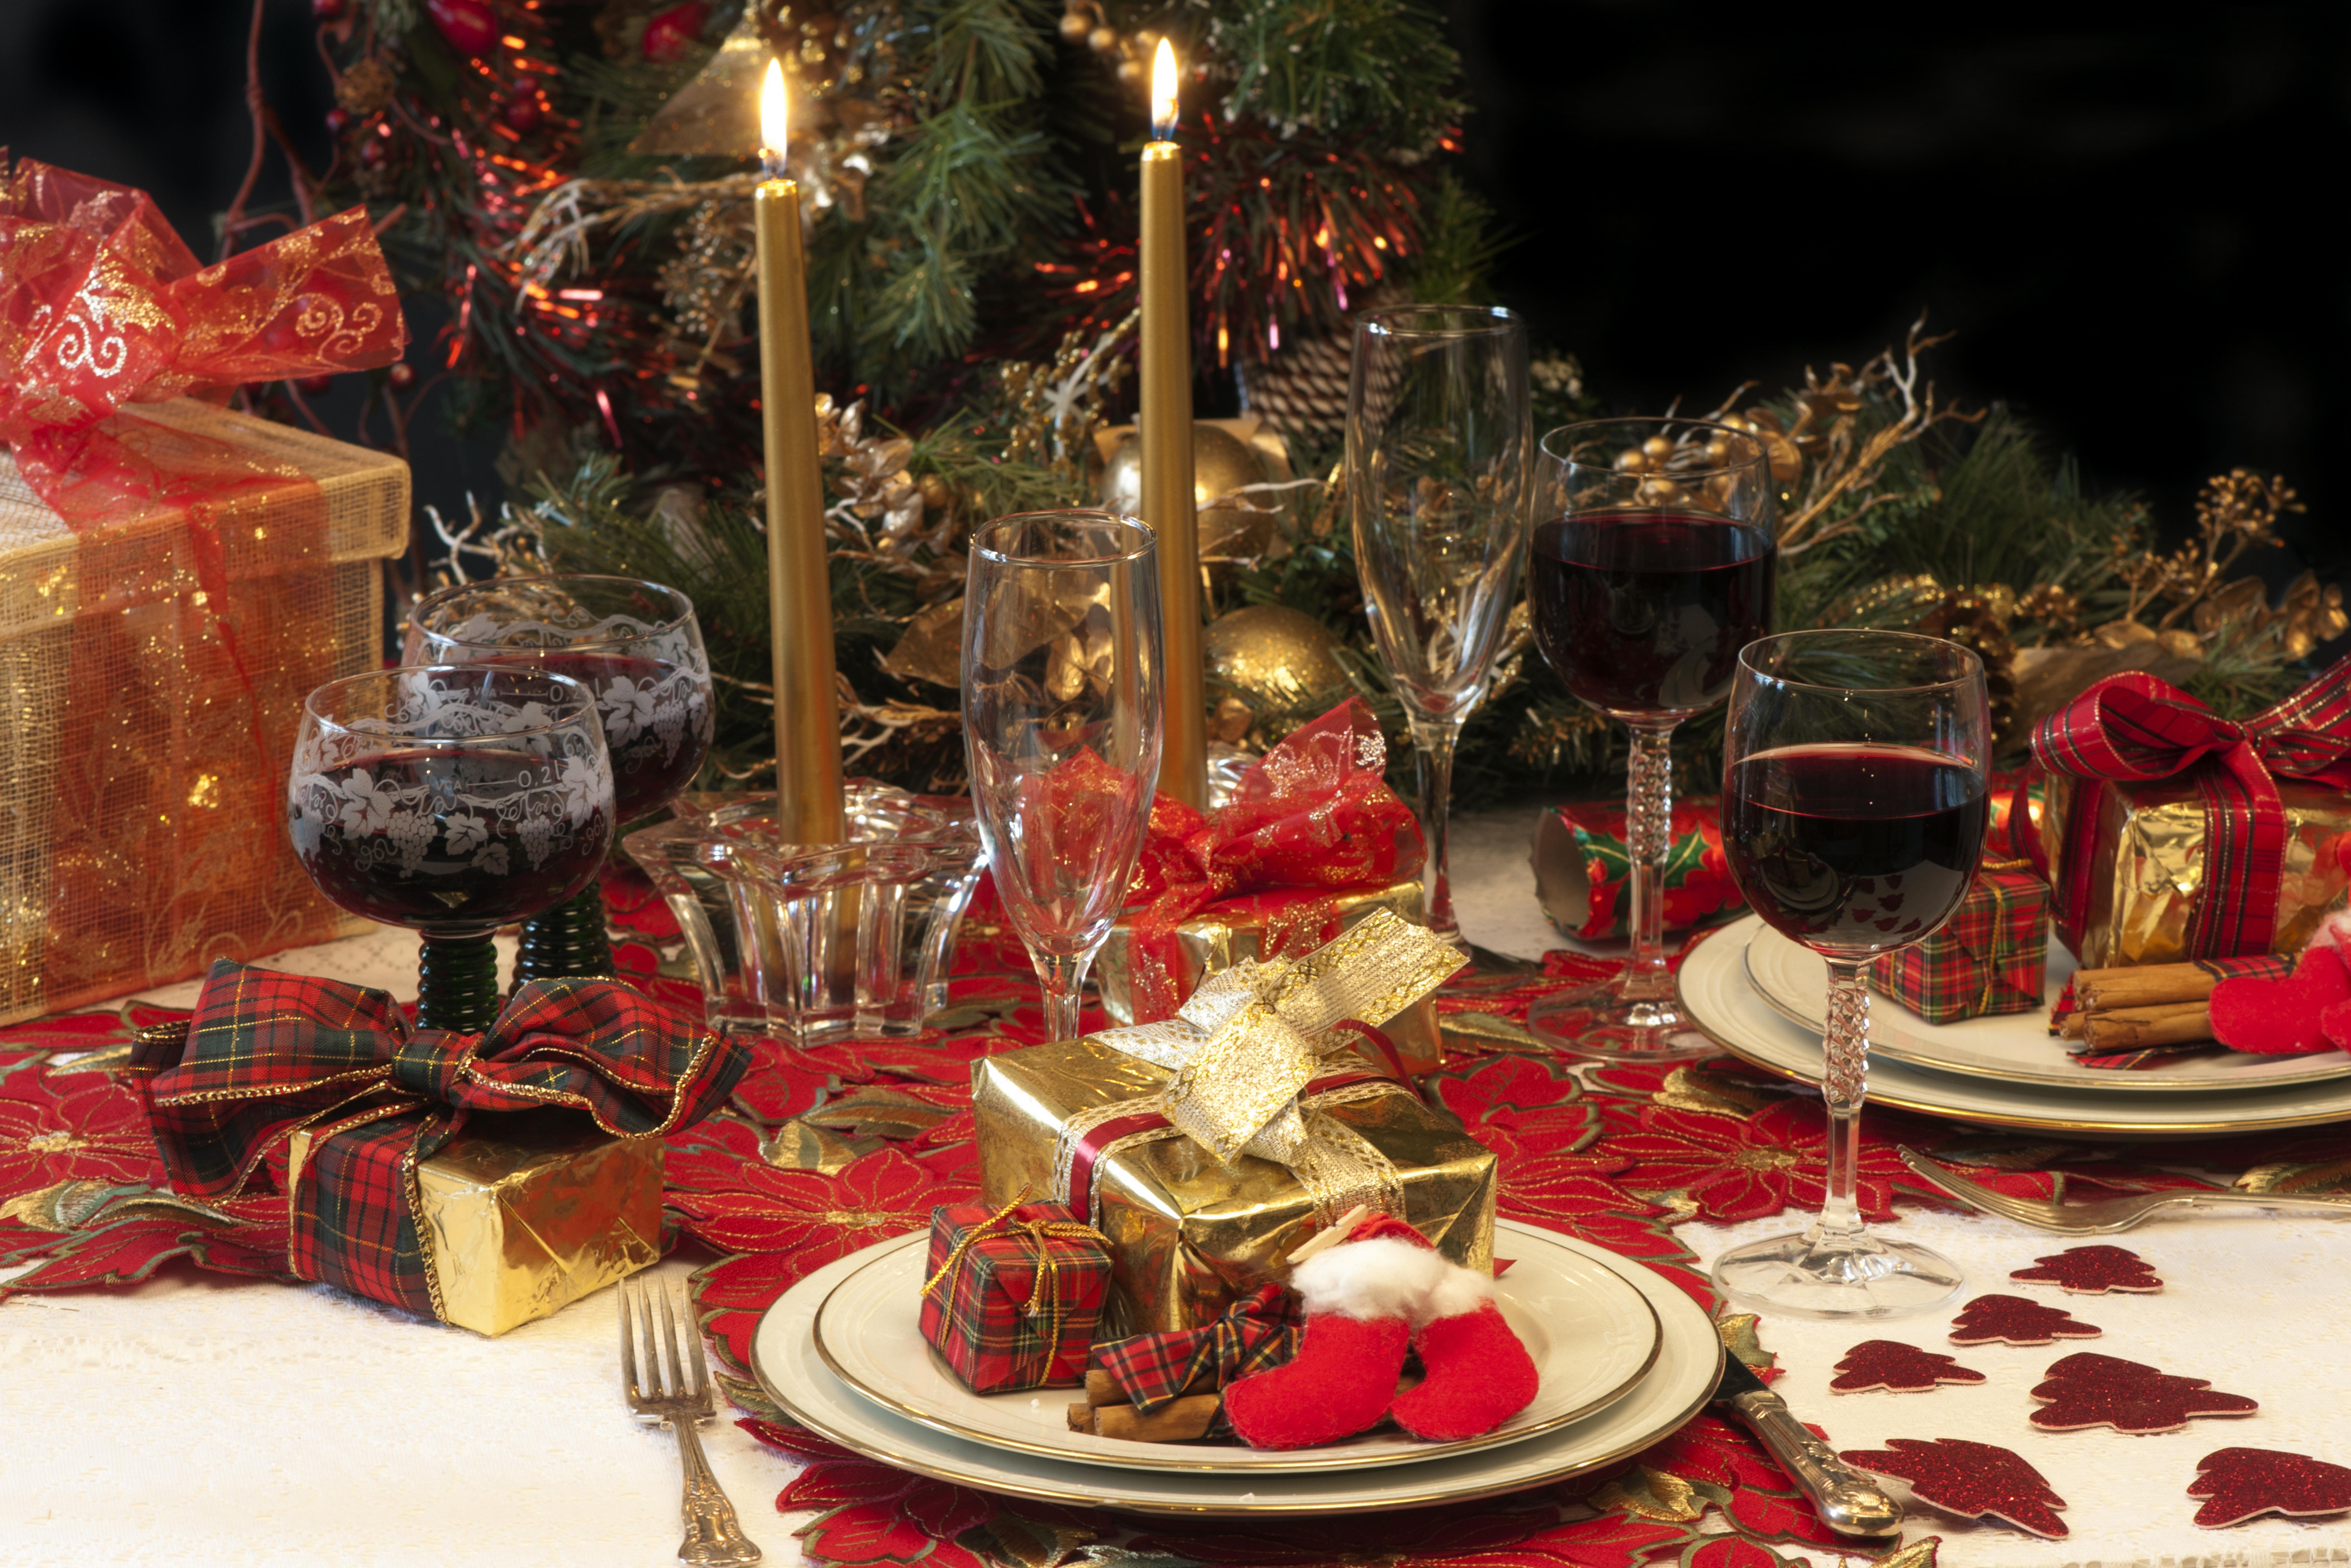 новогодний стол, свечи, бокалы